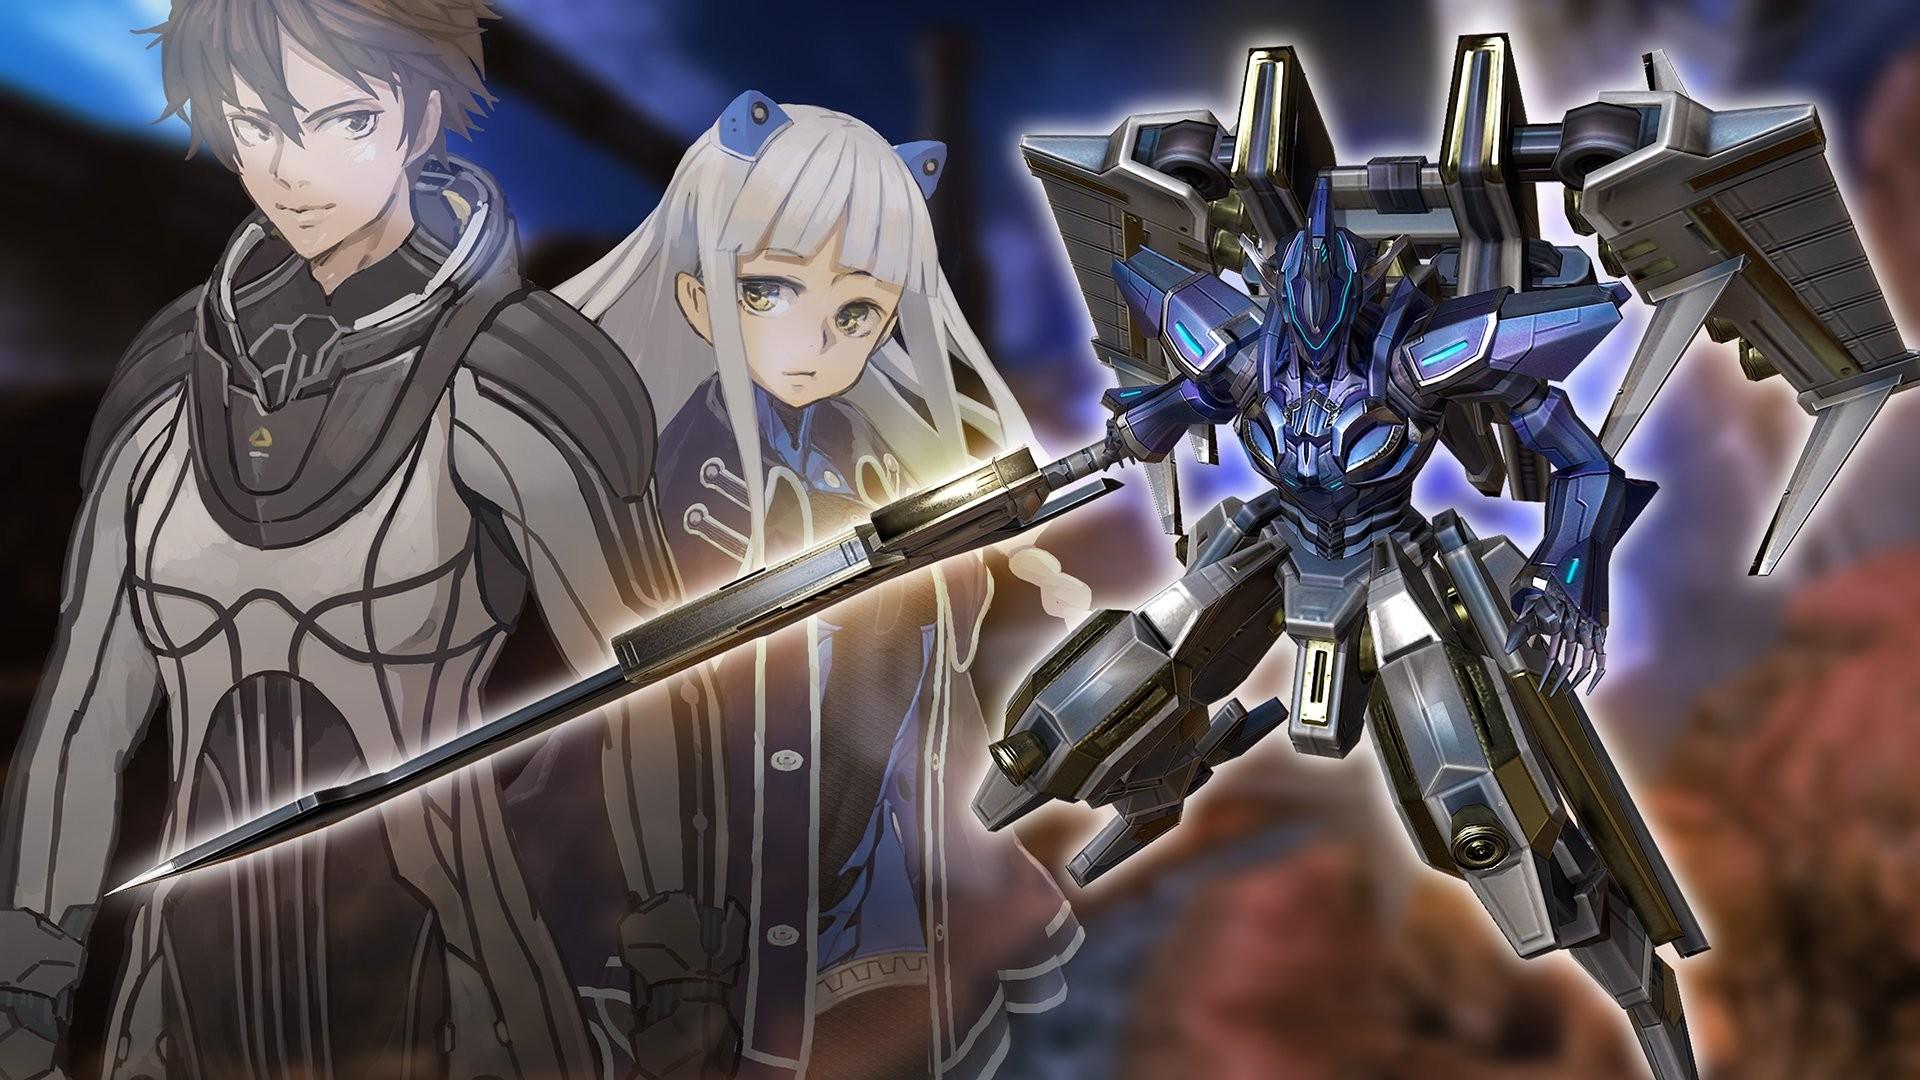 ASTEBREED sci-fi anime shooter fantasy action fighting mecha wallpaper      833273   WallpaperUP